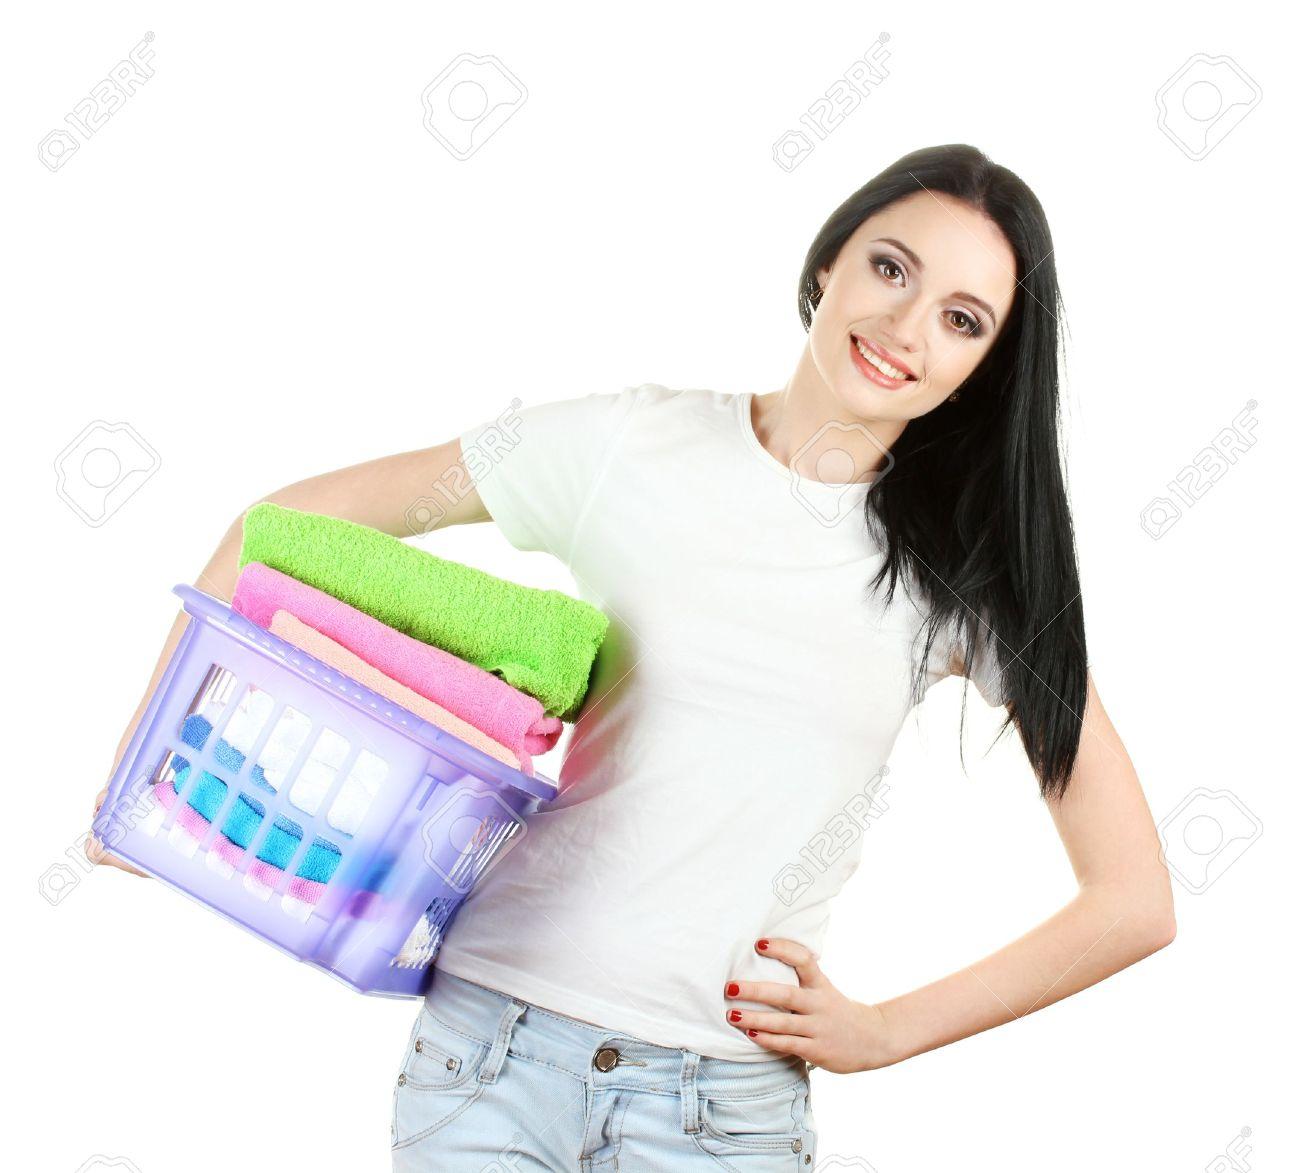 beautiful young girl holding basket of laundry isolated on white Stock Photo - 13050289